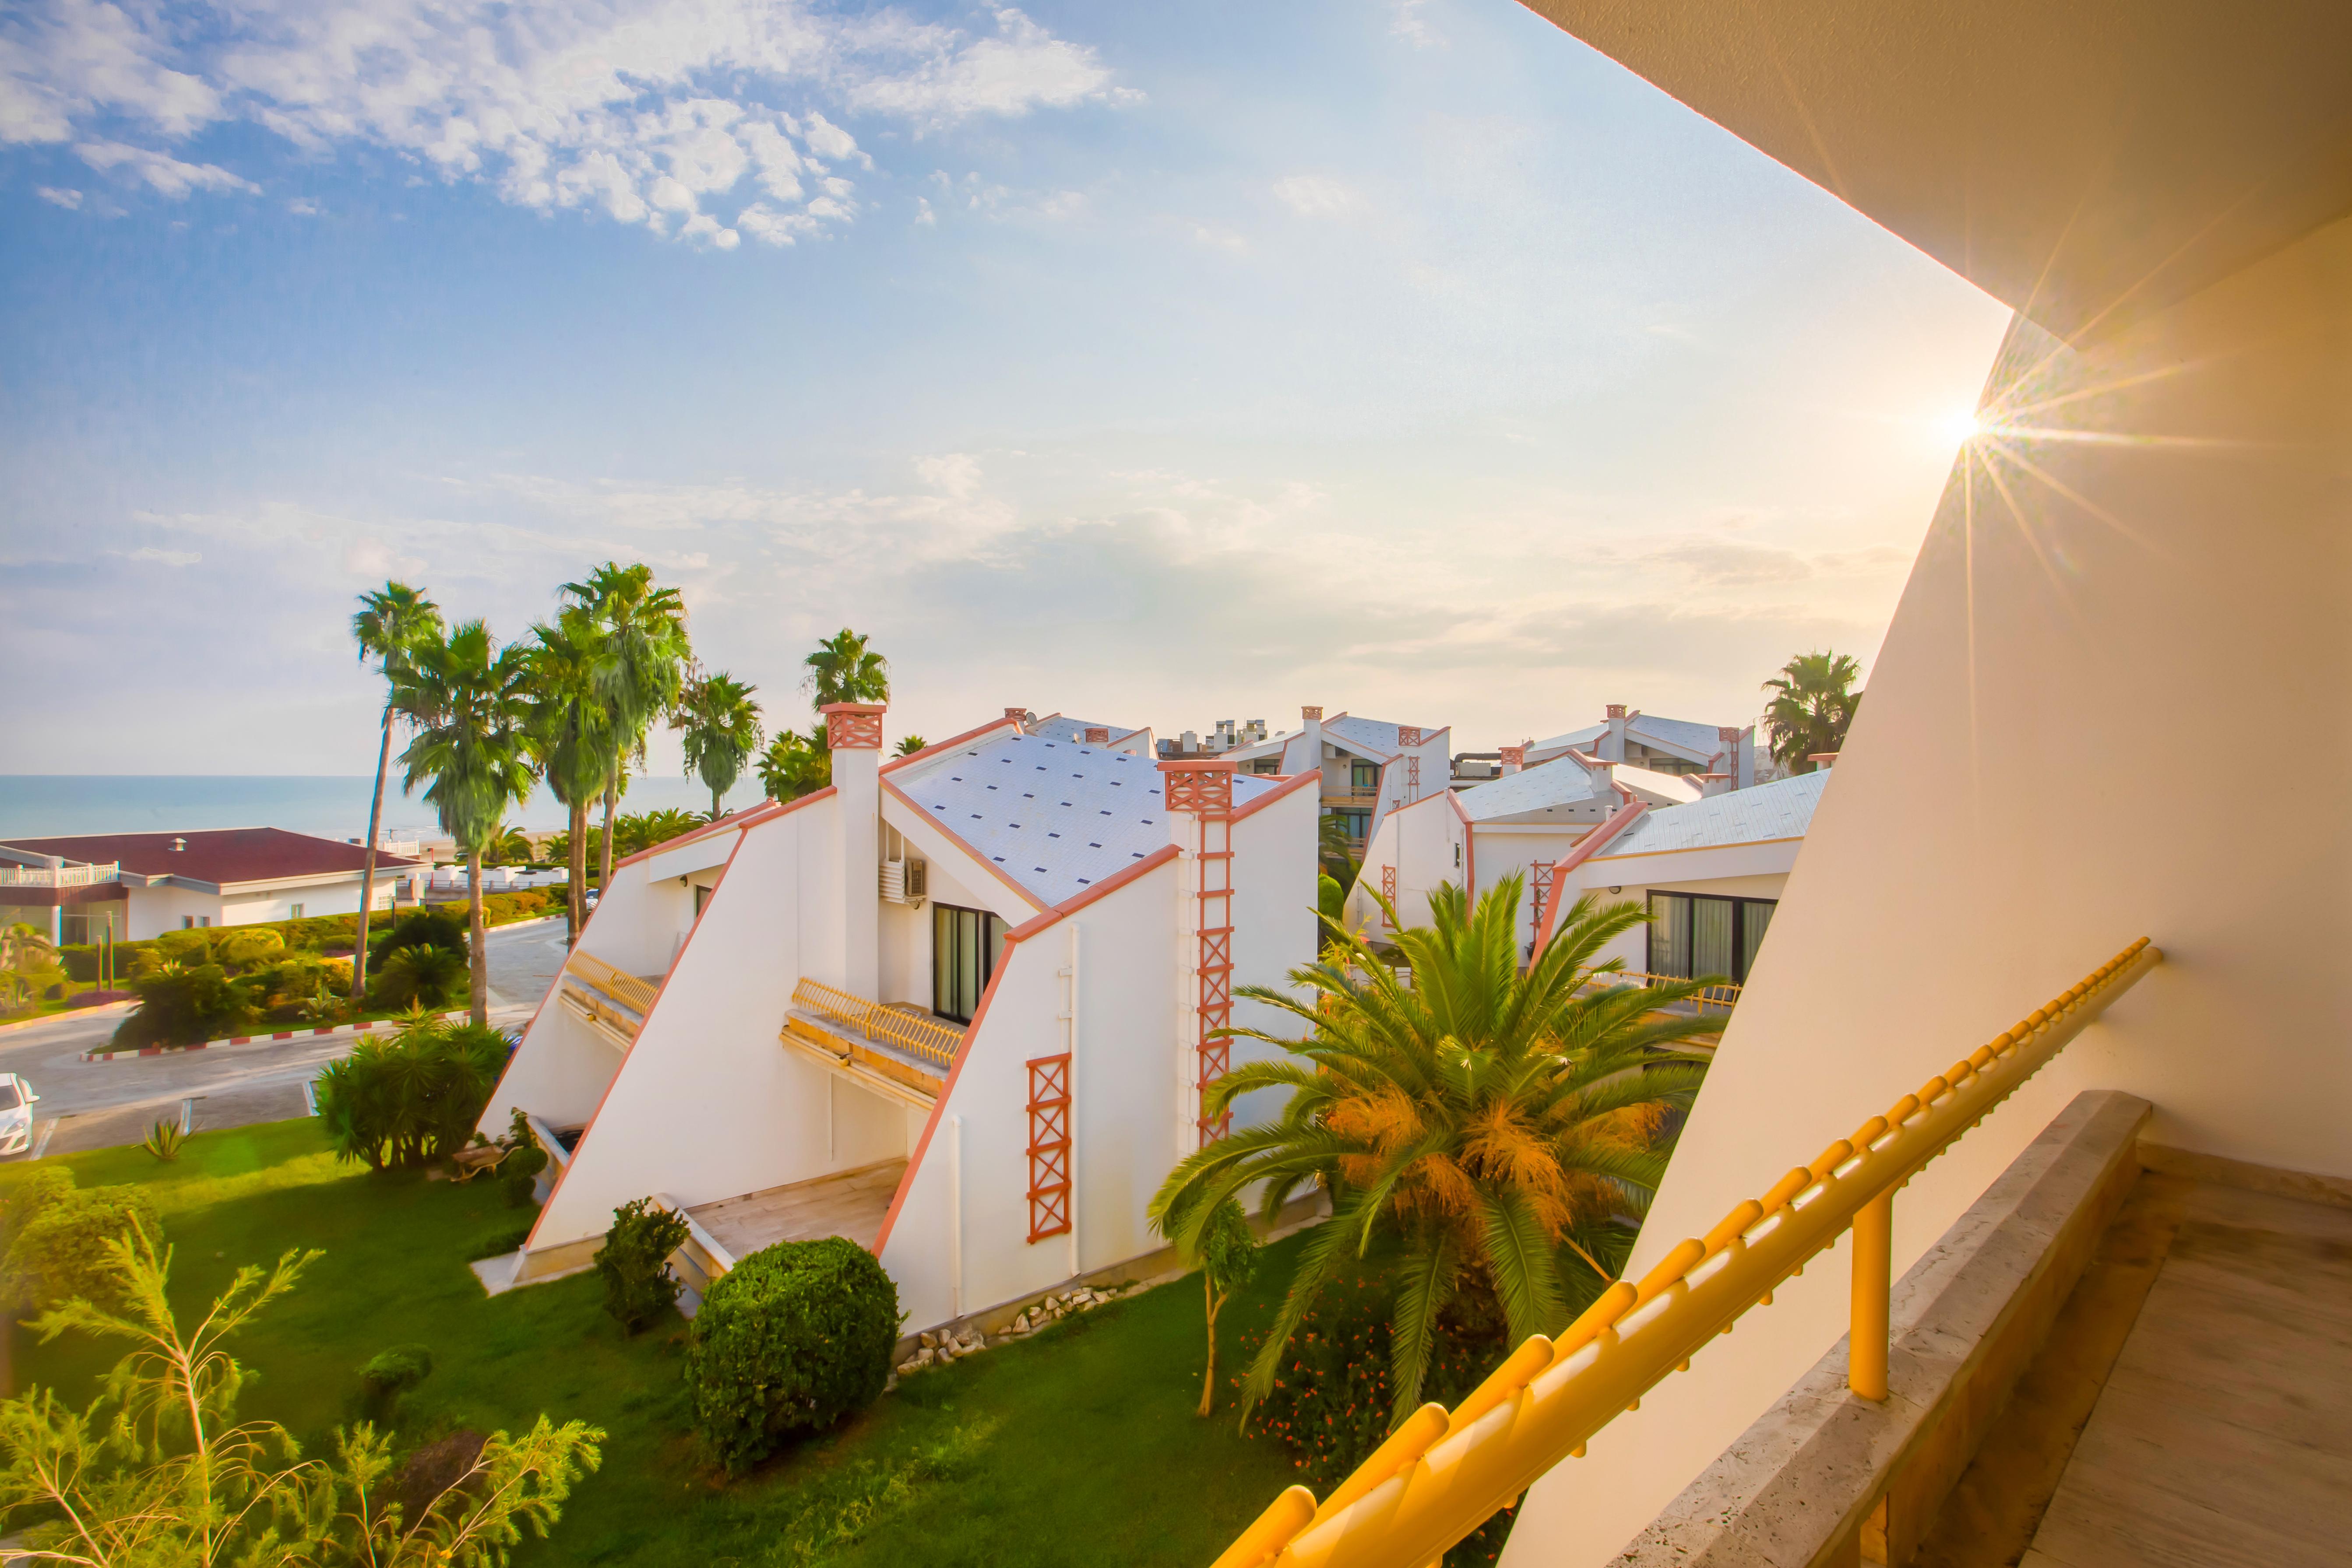 هتل ساحلي شهر ایزدشهر